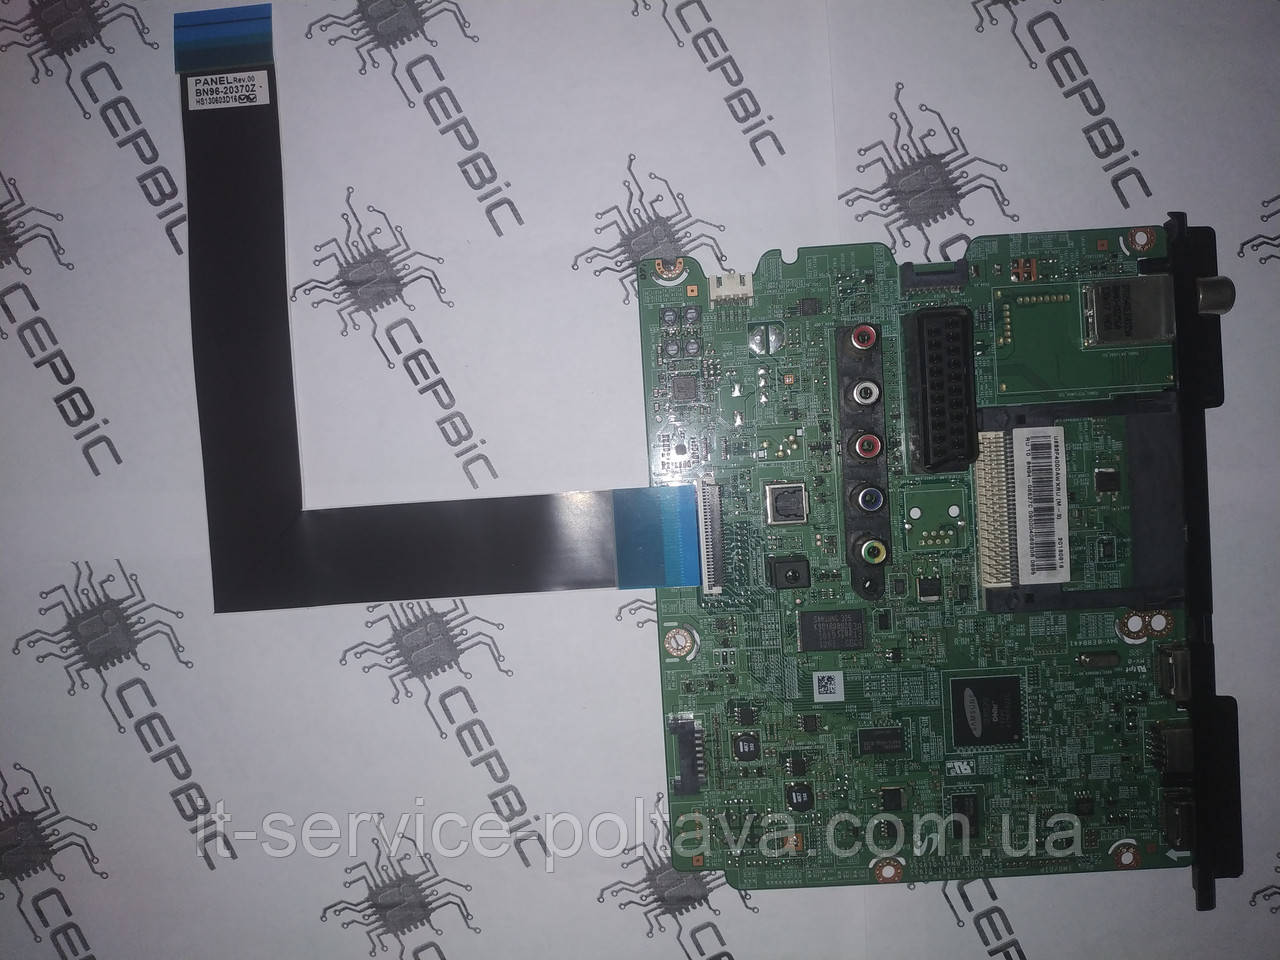 MainBoard (материнская (основная) плата) BN41-01955A (BN94-06332M) для LED телевизора Samsung  UE32F4020AW